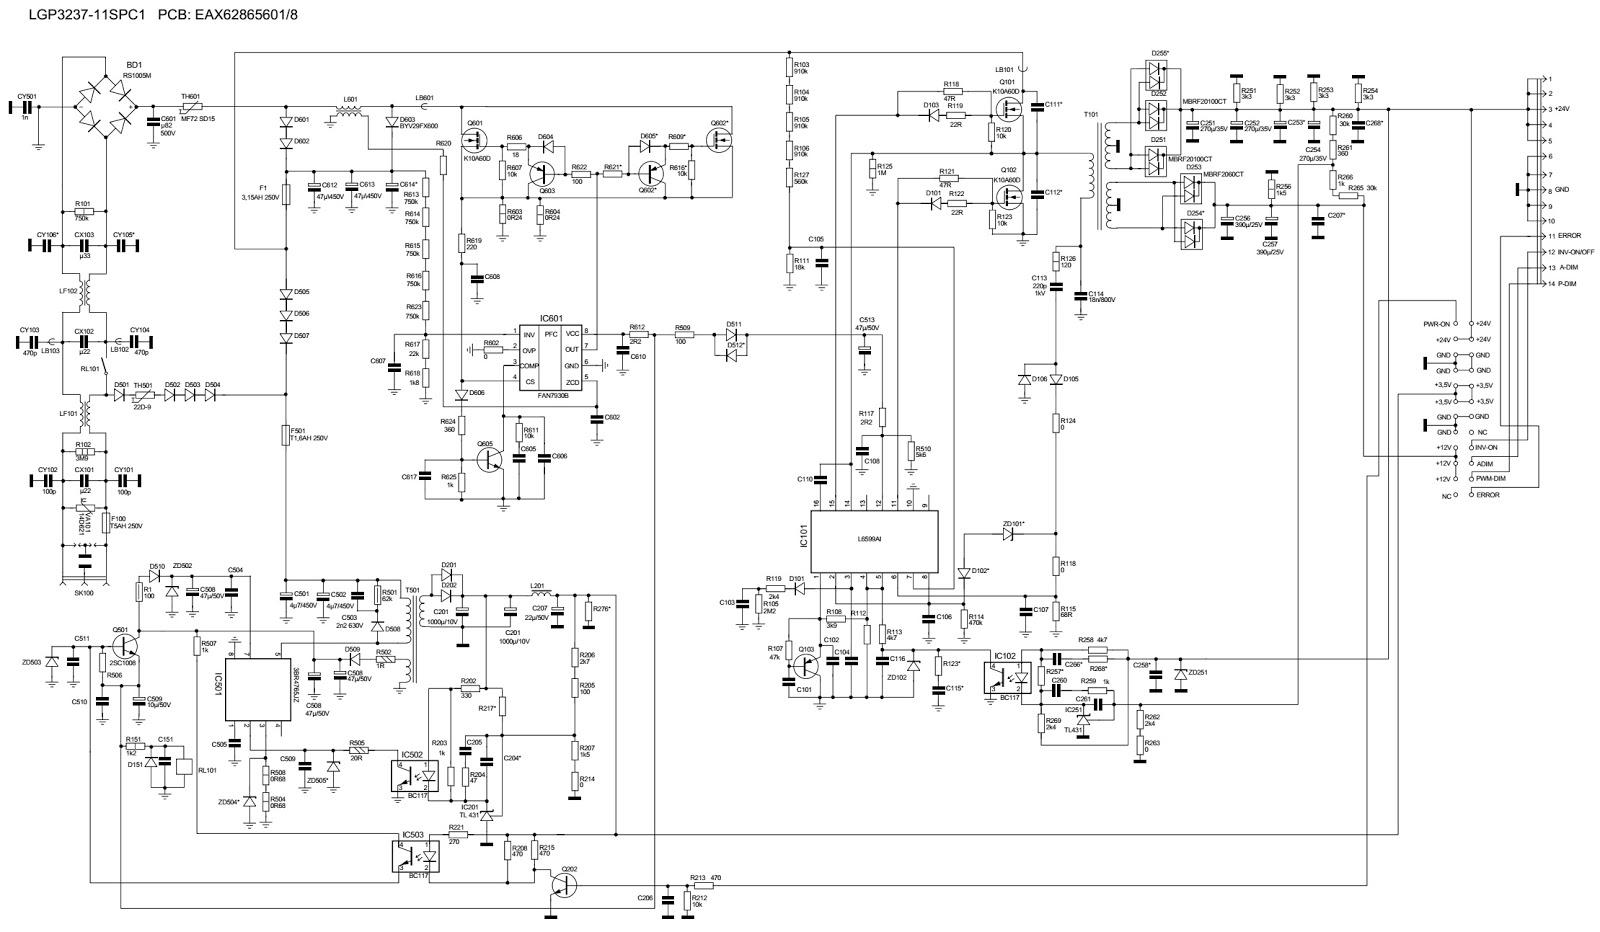 LG P3237 11SPC1 LCD TV SMPS Circuit Diagram EAX628656018